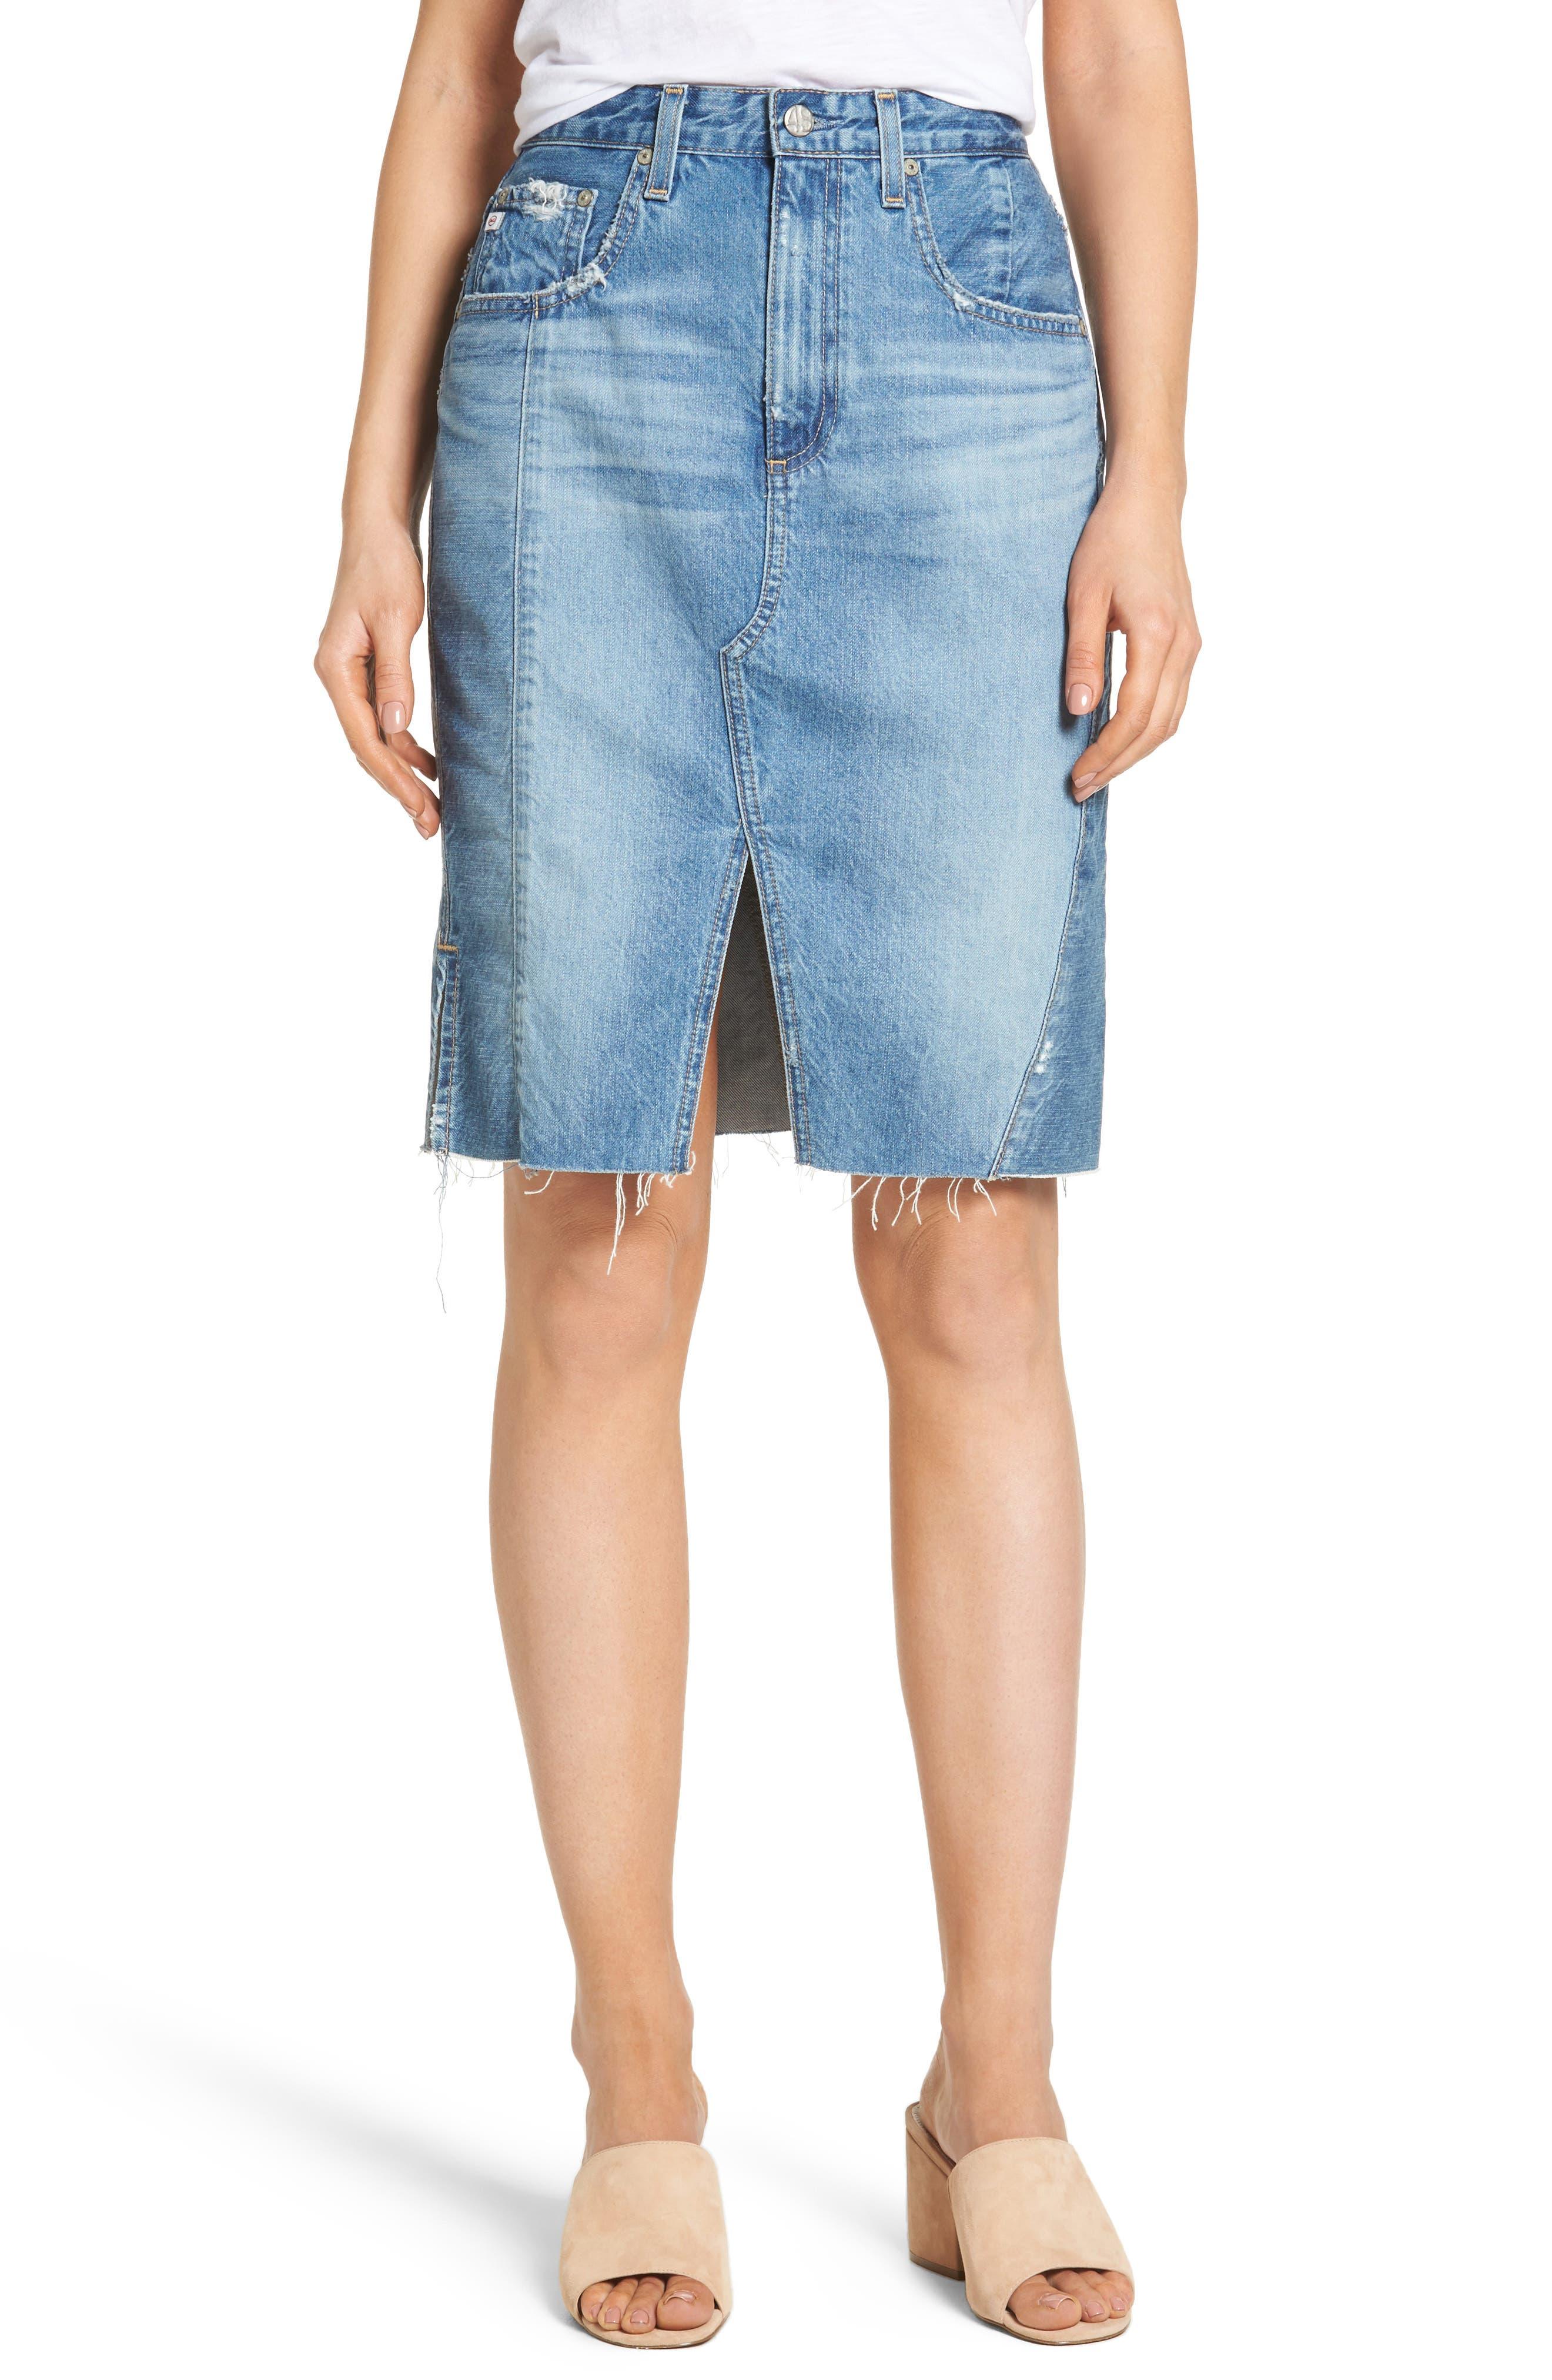 Alternate Image 1 Selected - AG The Emery High Waist Denim Skirt (18 Years Blue Fawn)